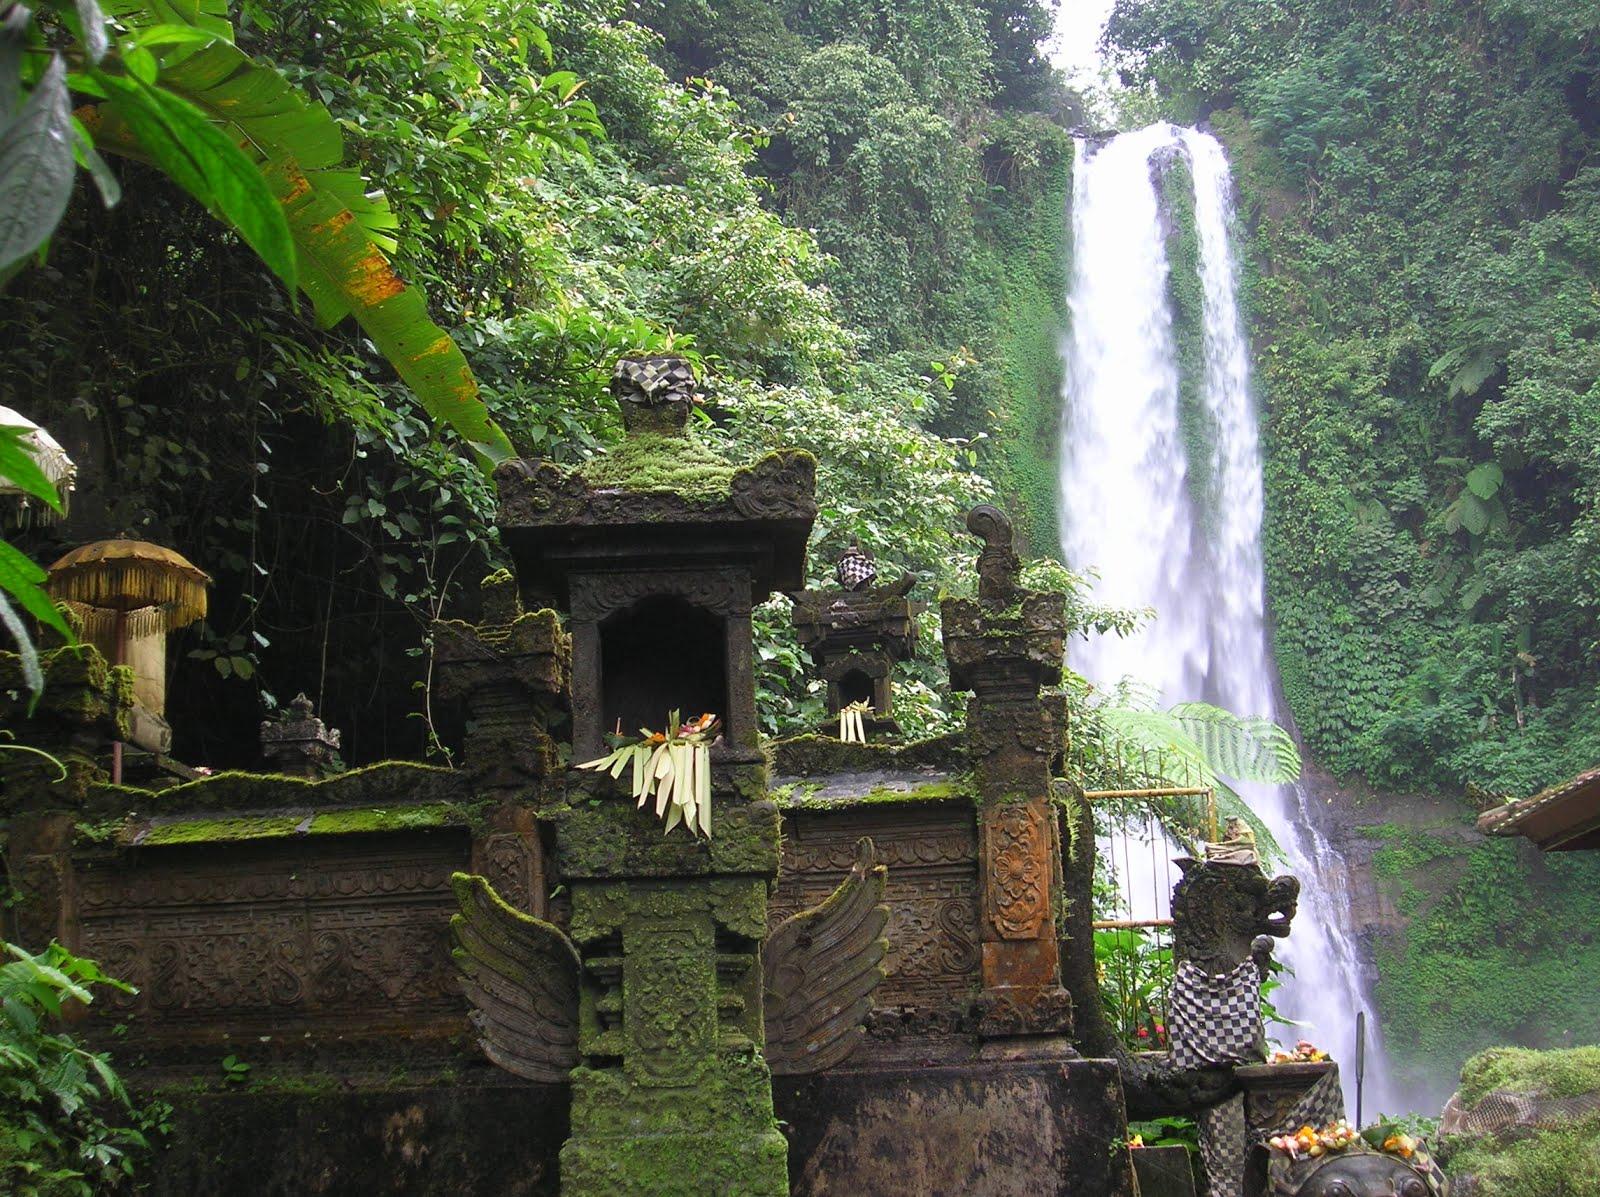 Cascada de Git Git, Isla de Bali,Indonesia, vuelta al mundo, round the world, La vuelta al mundo de Asun y Ricardo